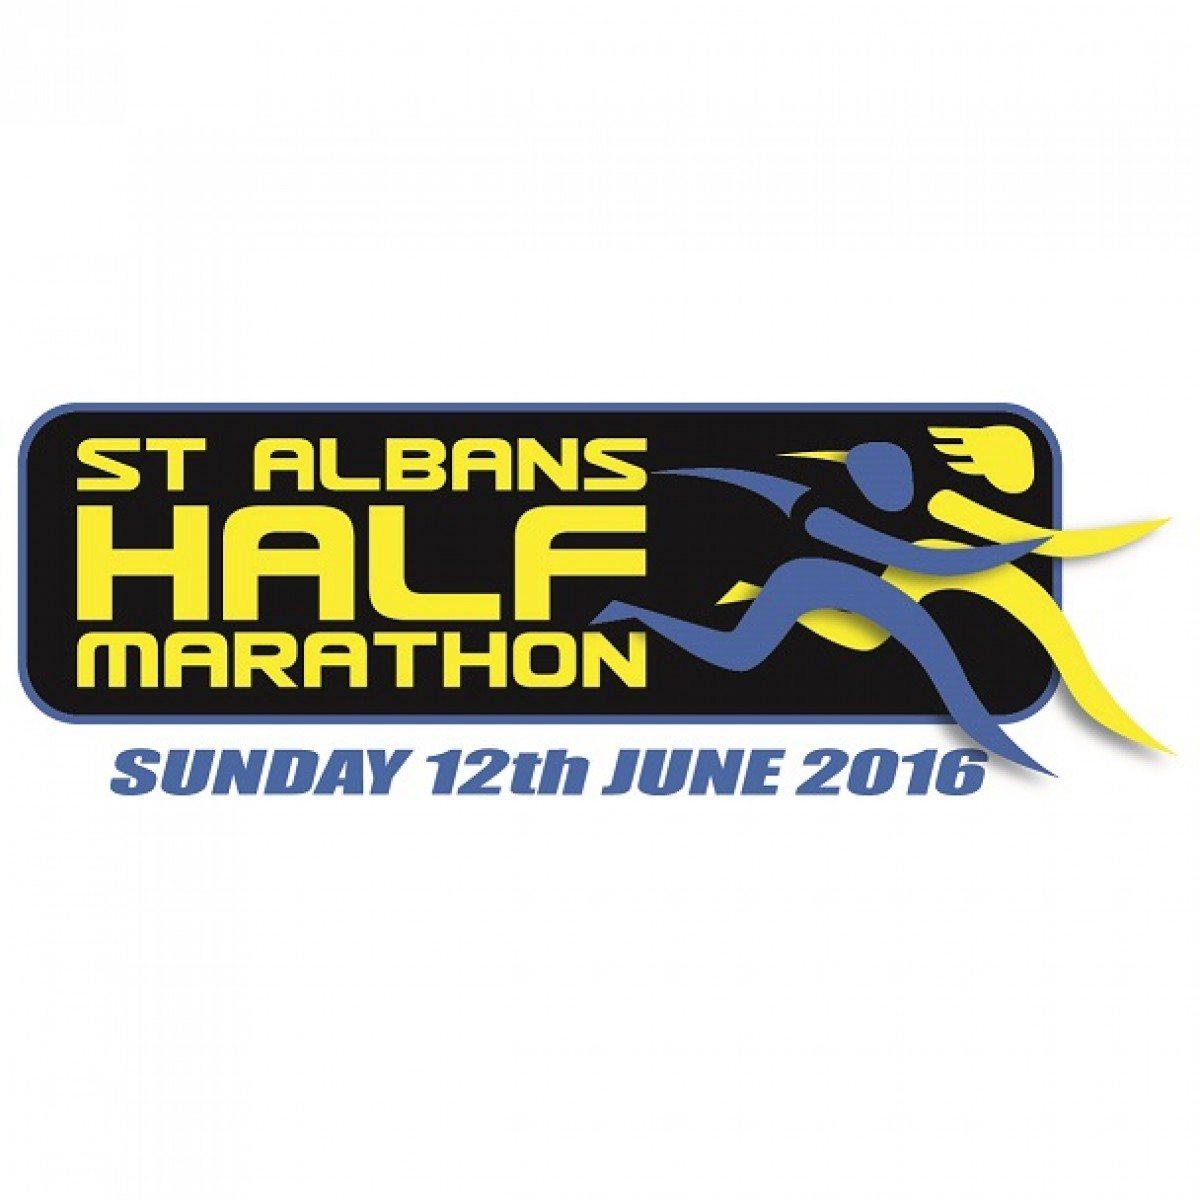 St Albans Half Marathon's logo